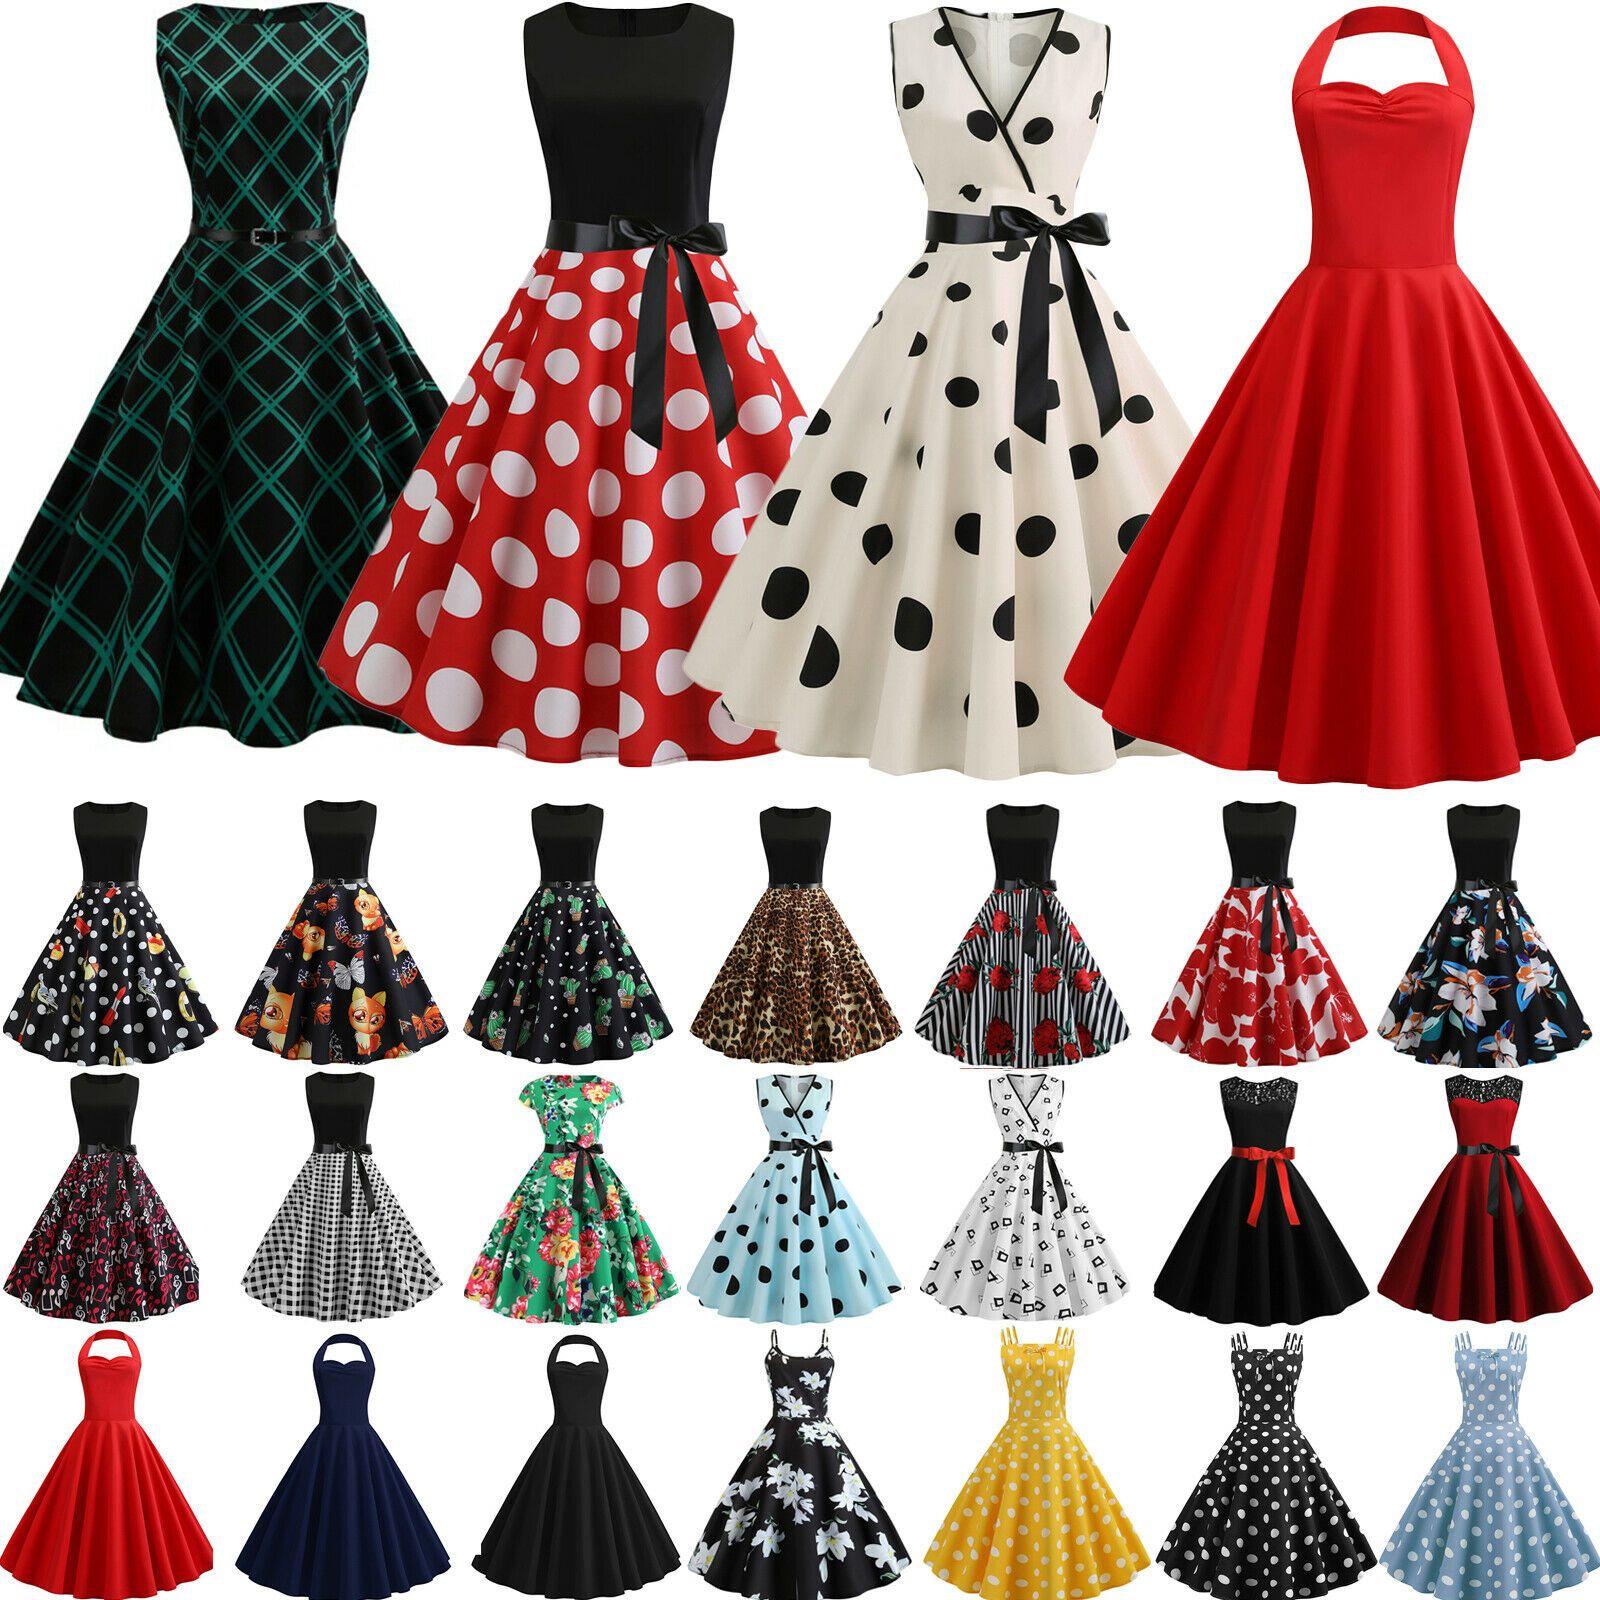 Details Zu Damen Kleid Rockabilly Petticoat Sommer Retro 50er 60er Jahre Vintage Partykleid Polka Dress Short Sleeve Mini Dress Womens Polka Dot Dress